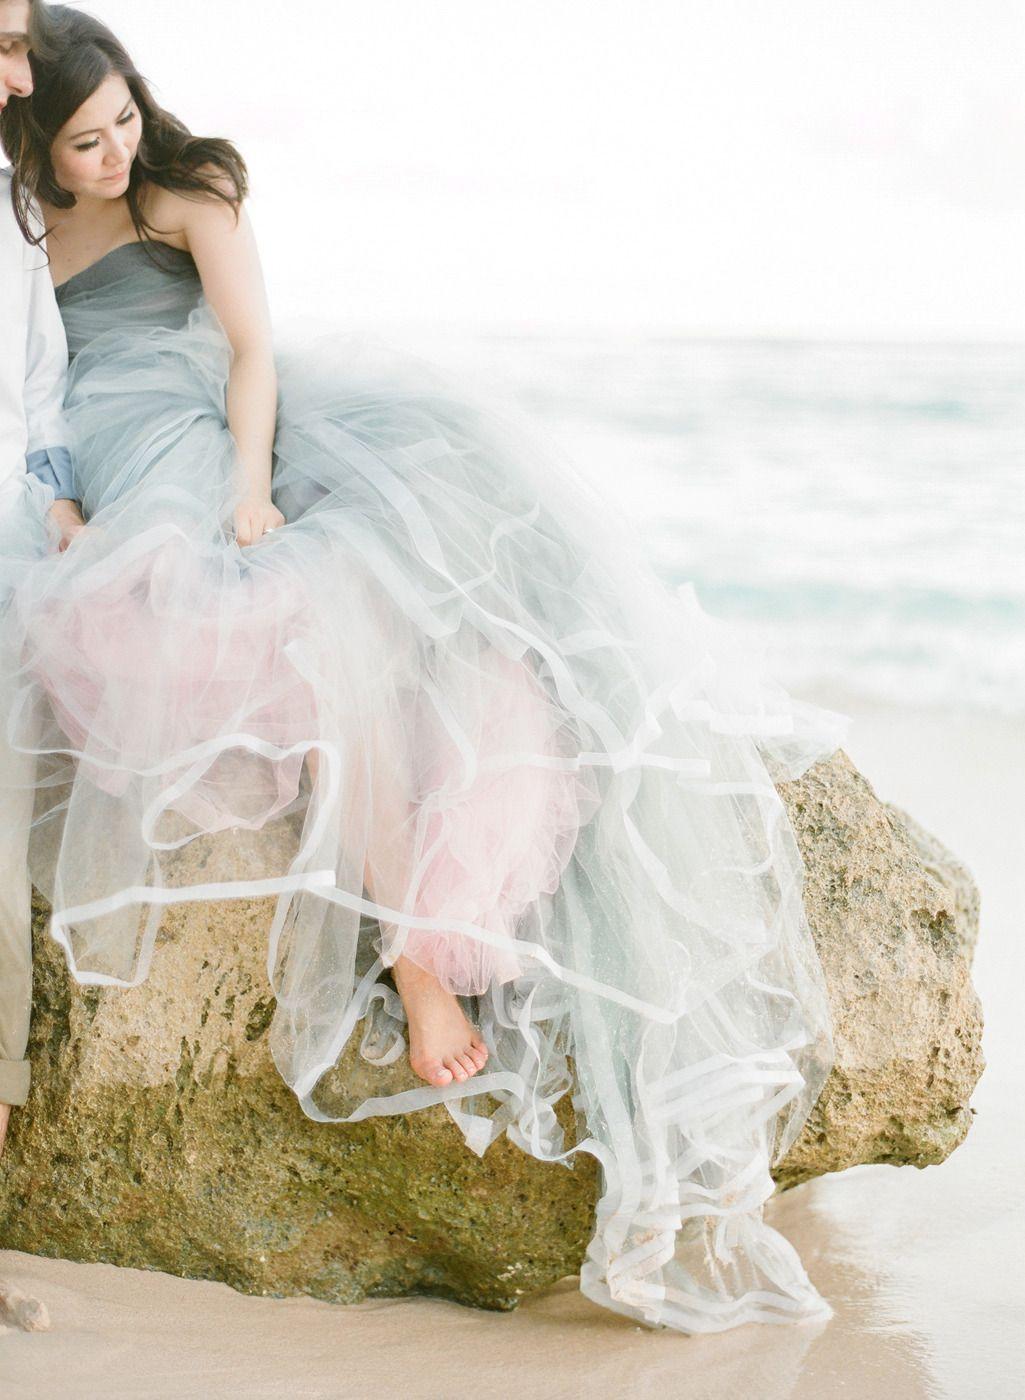 Bali Beach Engagement Session Non White Wedding Dresses Dip Dye Wedding Dress Dye Wedding Dress